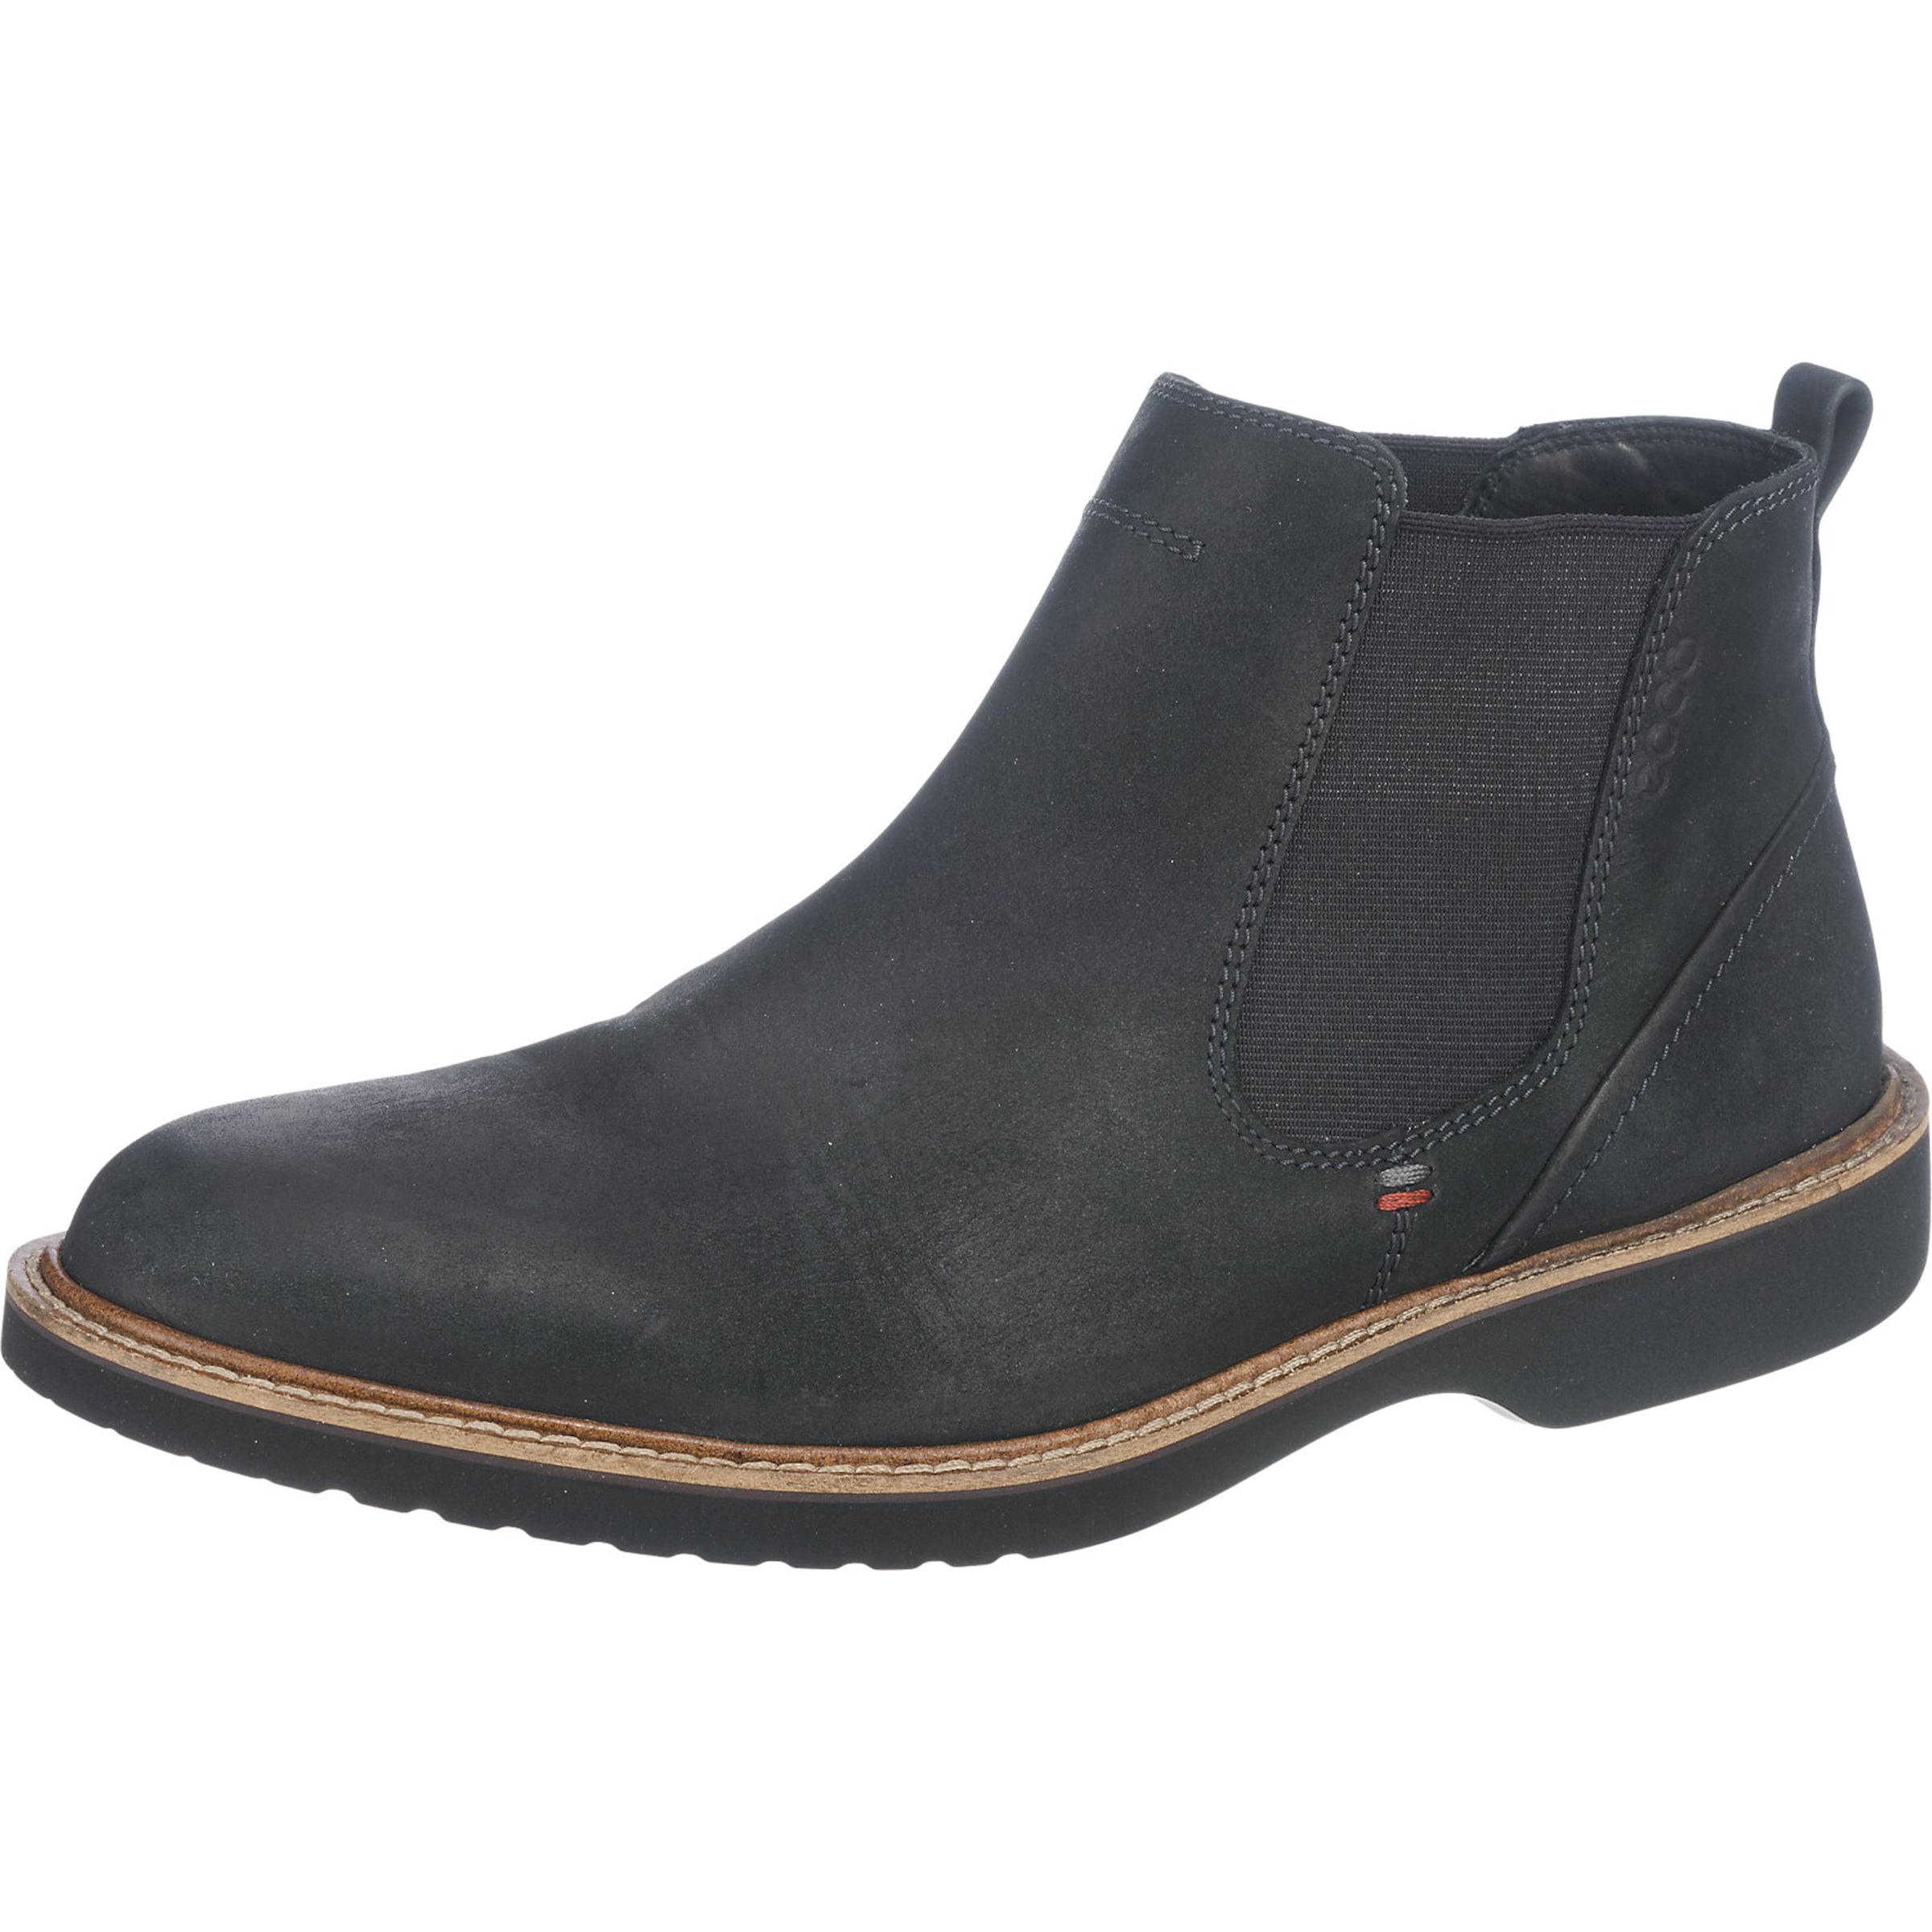 ECCO Ian Stiefeletten Günstige und langlebige Schuhe